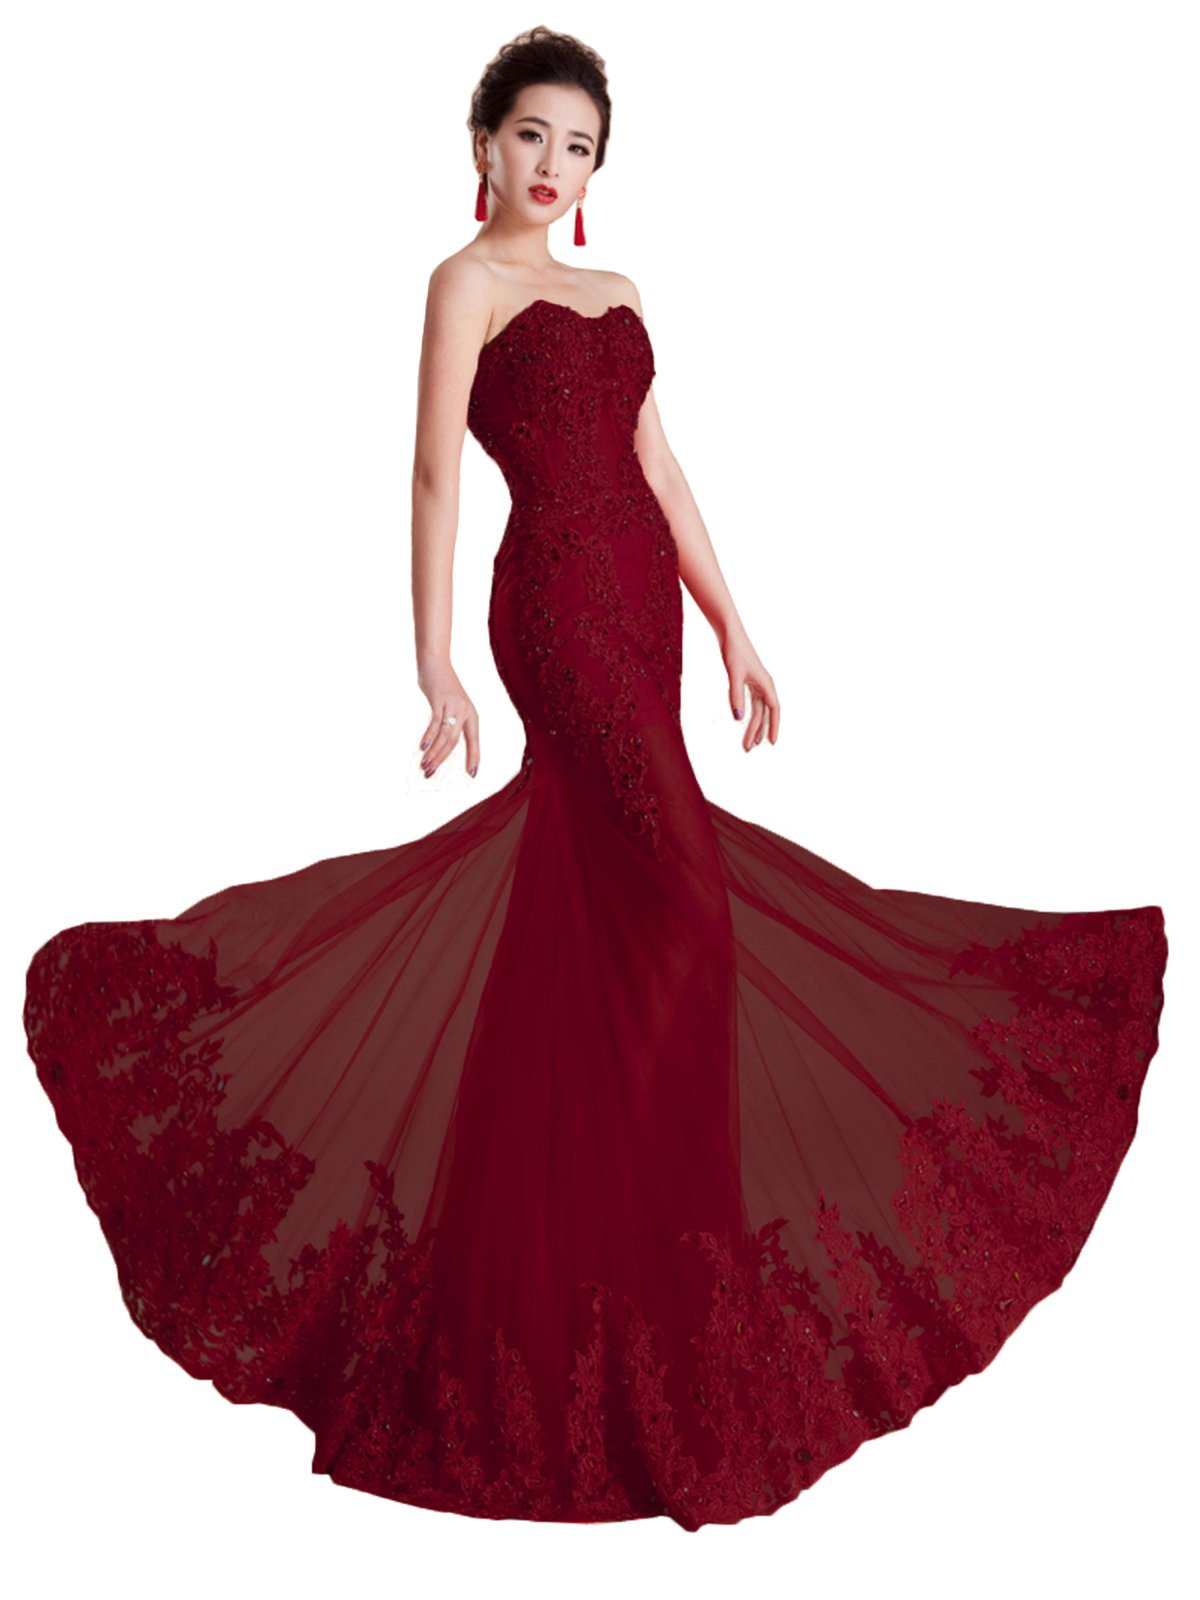 FELALA Women's Sweetheart Mermaid Lace Long Evening Prom Dresses Burgundy 10